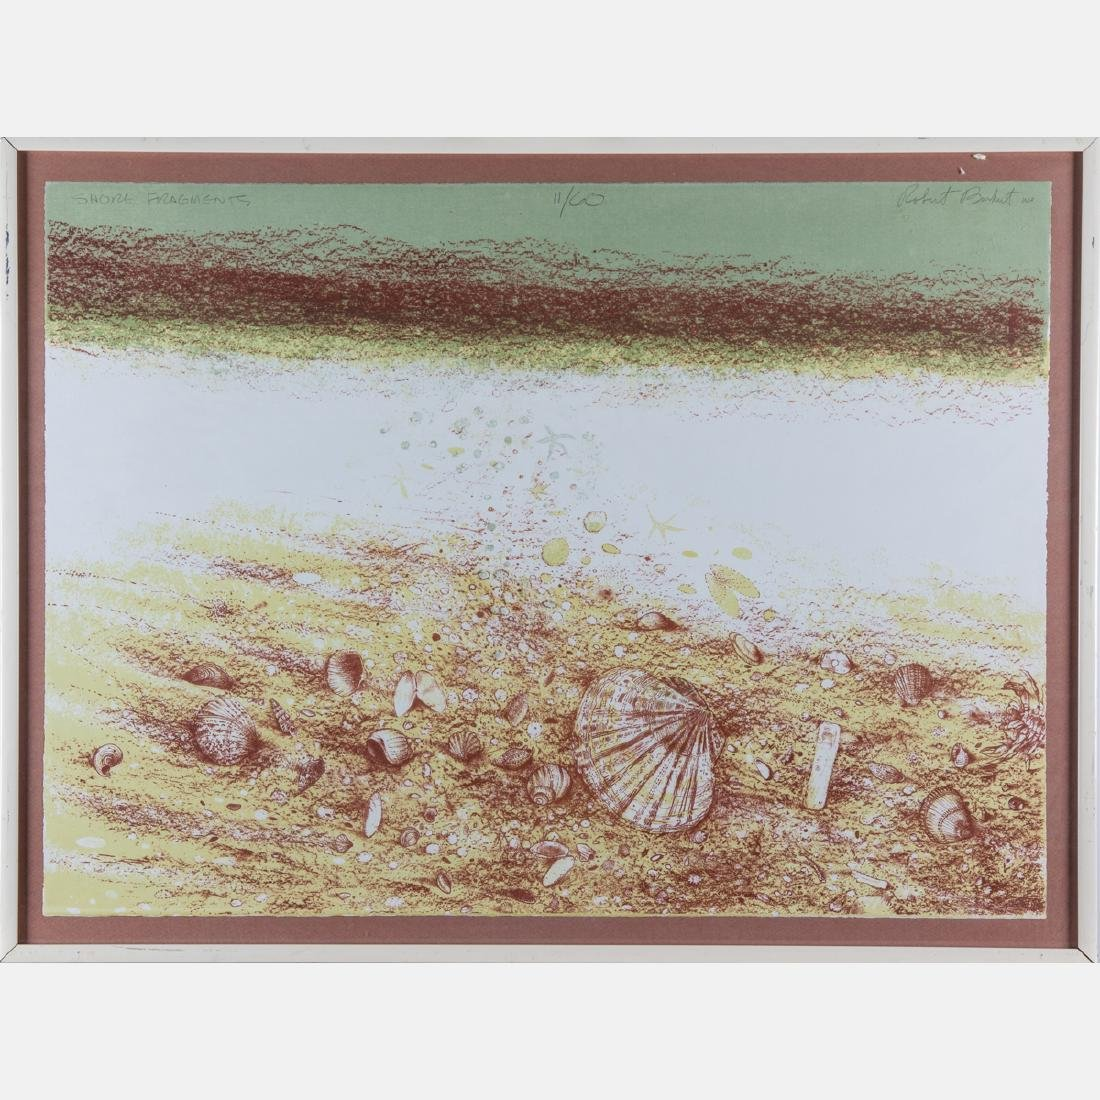 Robert Randall Burkert (b. 1930) 'Sea Edge' and 'Shore - 4